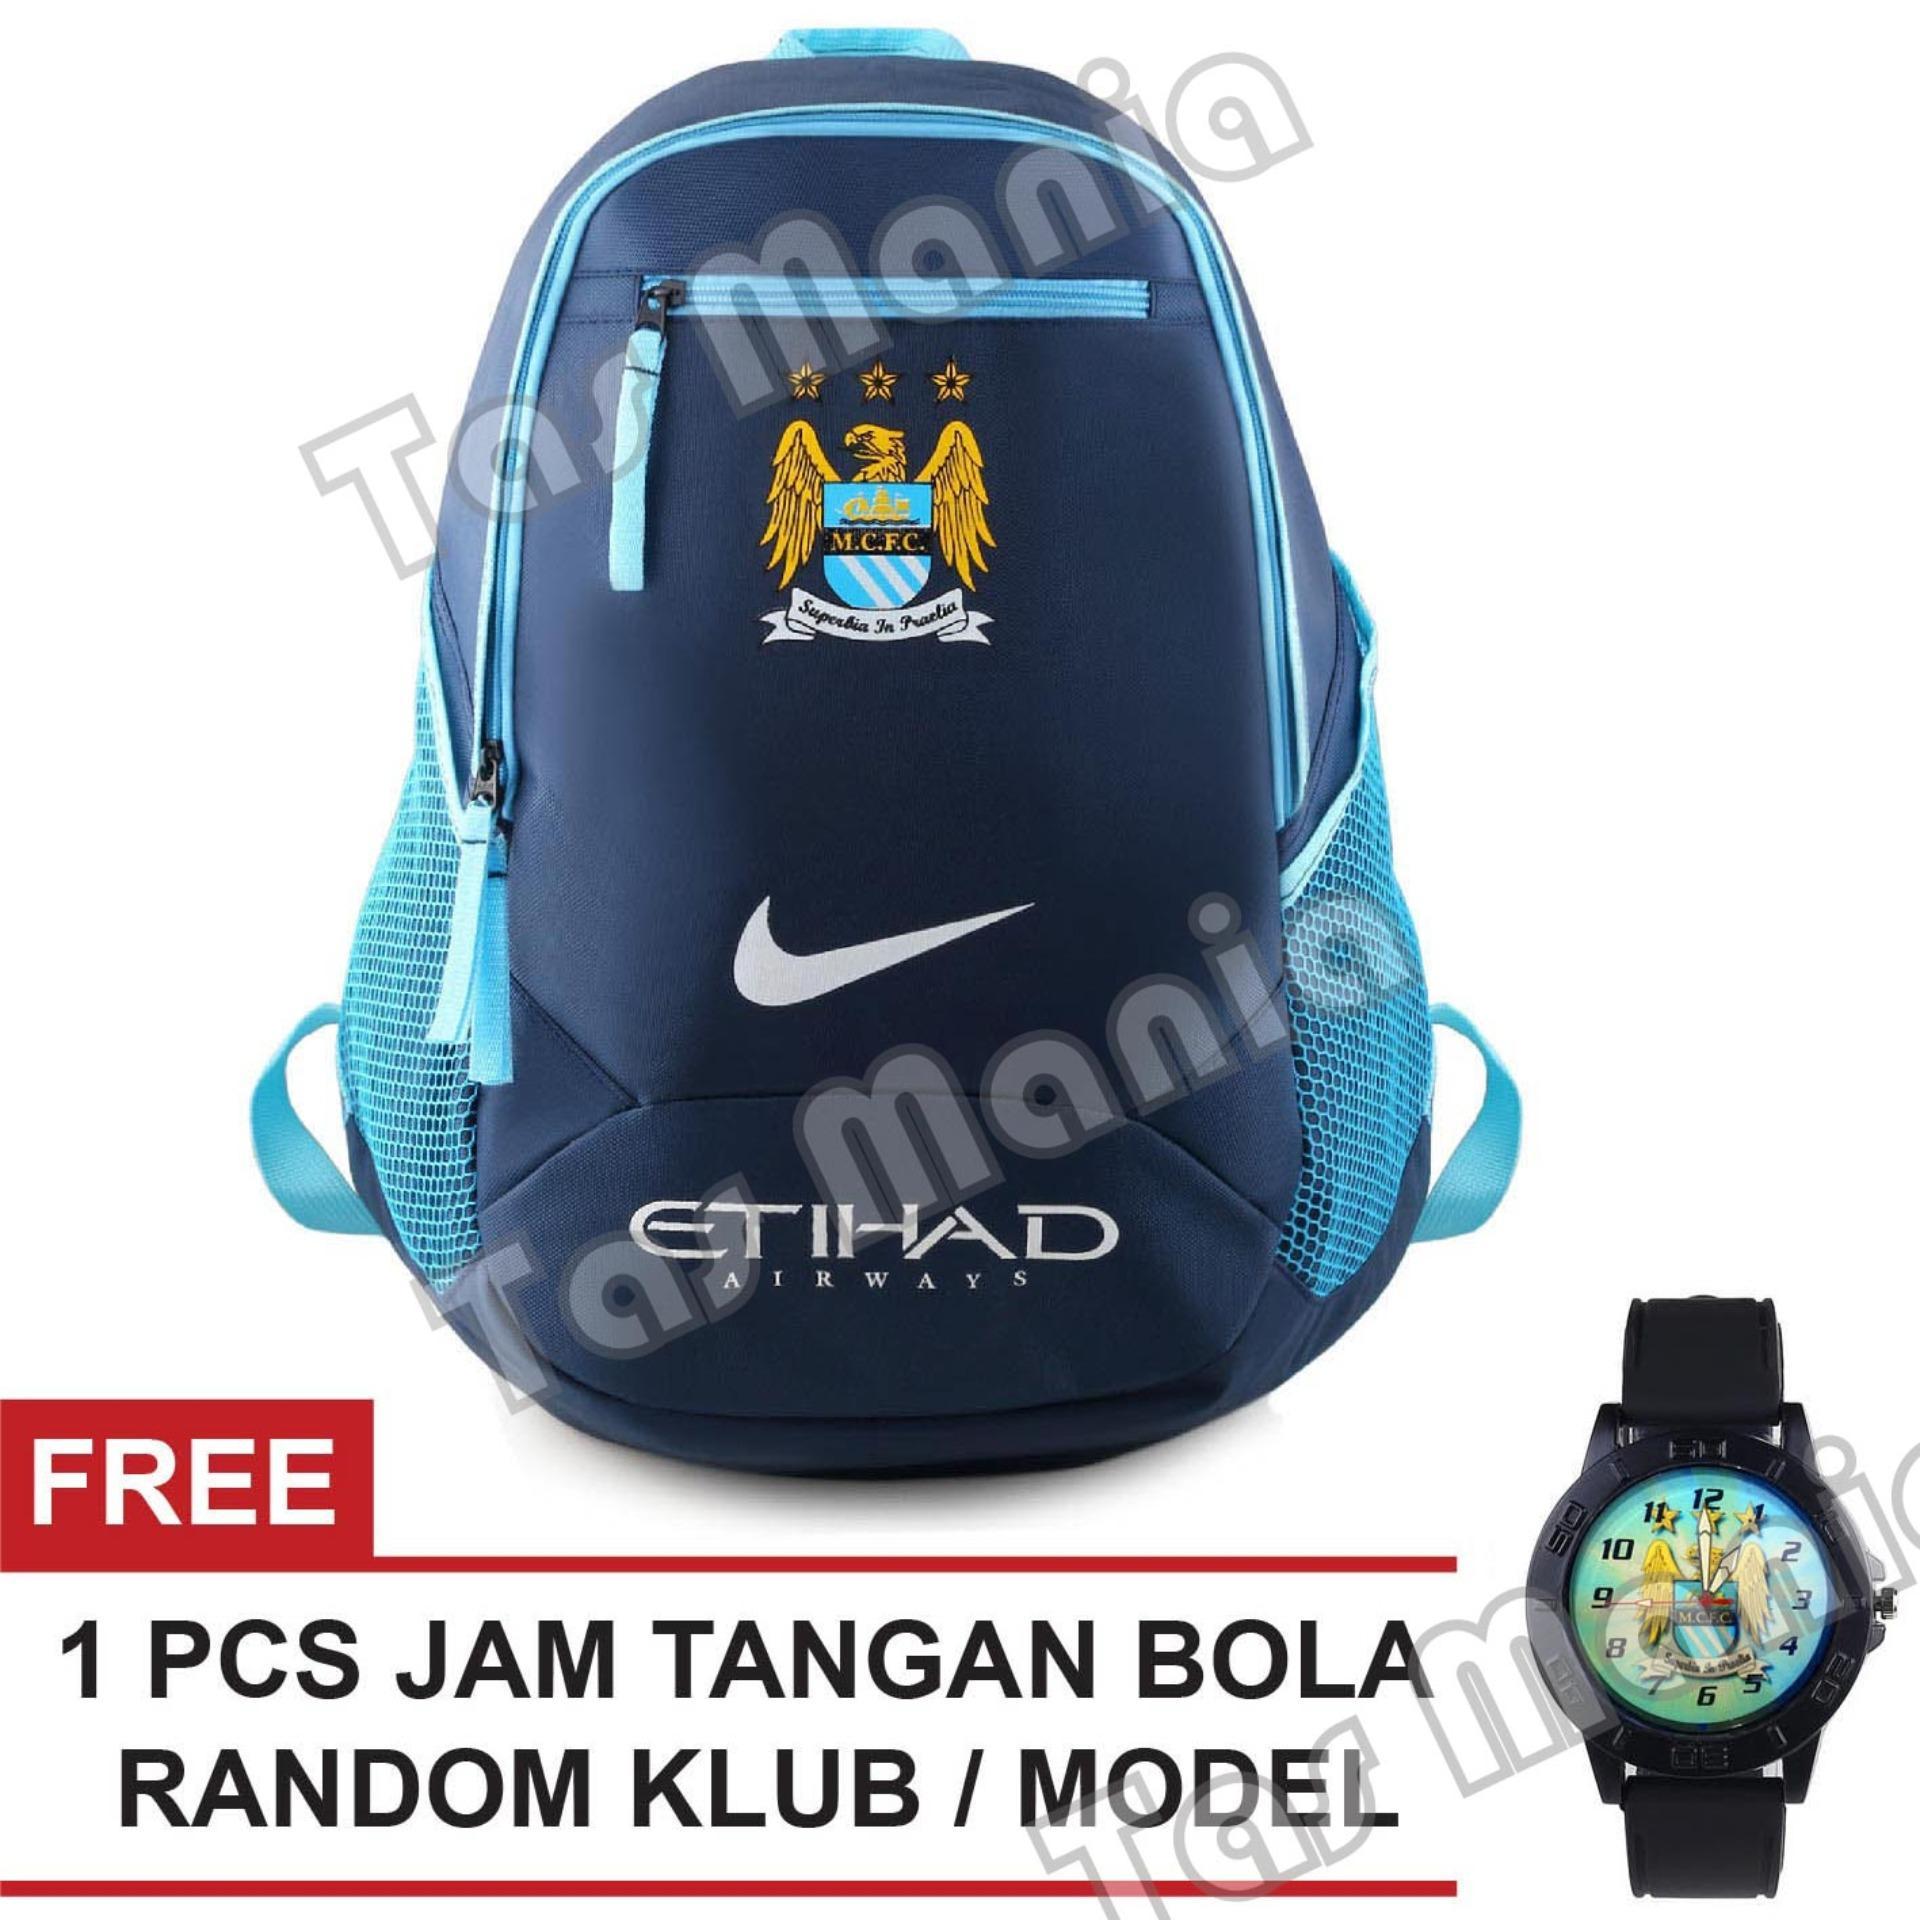 Tas Ransel Nike Bola Pria The Citizens - Etihad Laptop Backpack Mens Soccer Editions - Blue + Raincover + FREE Jam Tangan Pria Random Color / Model